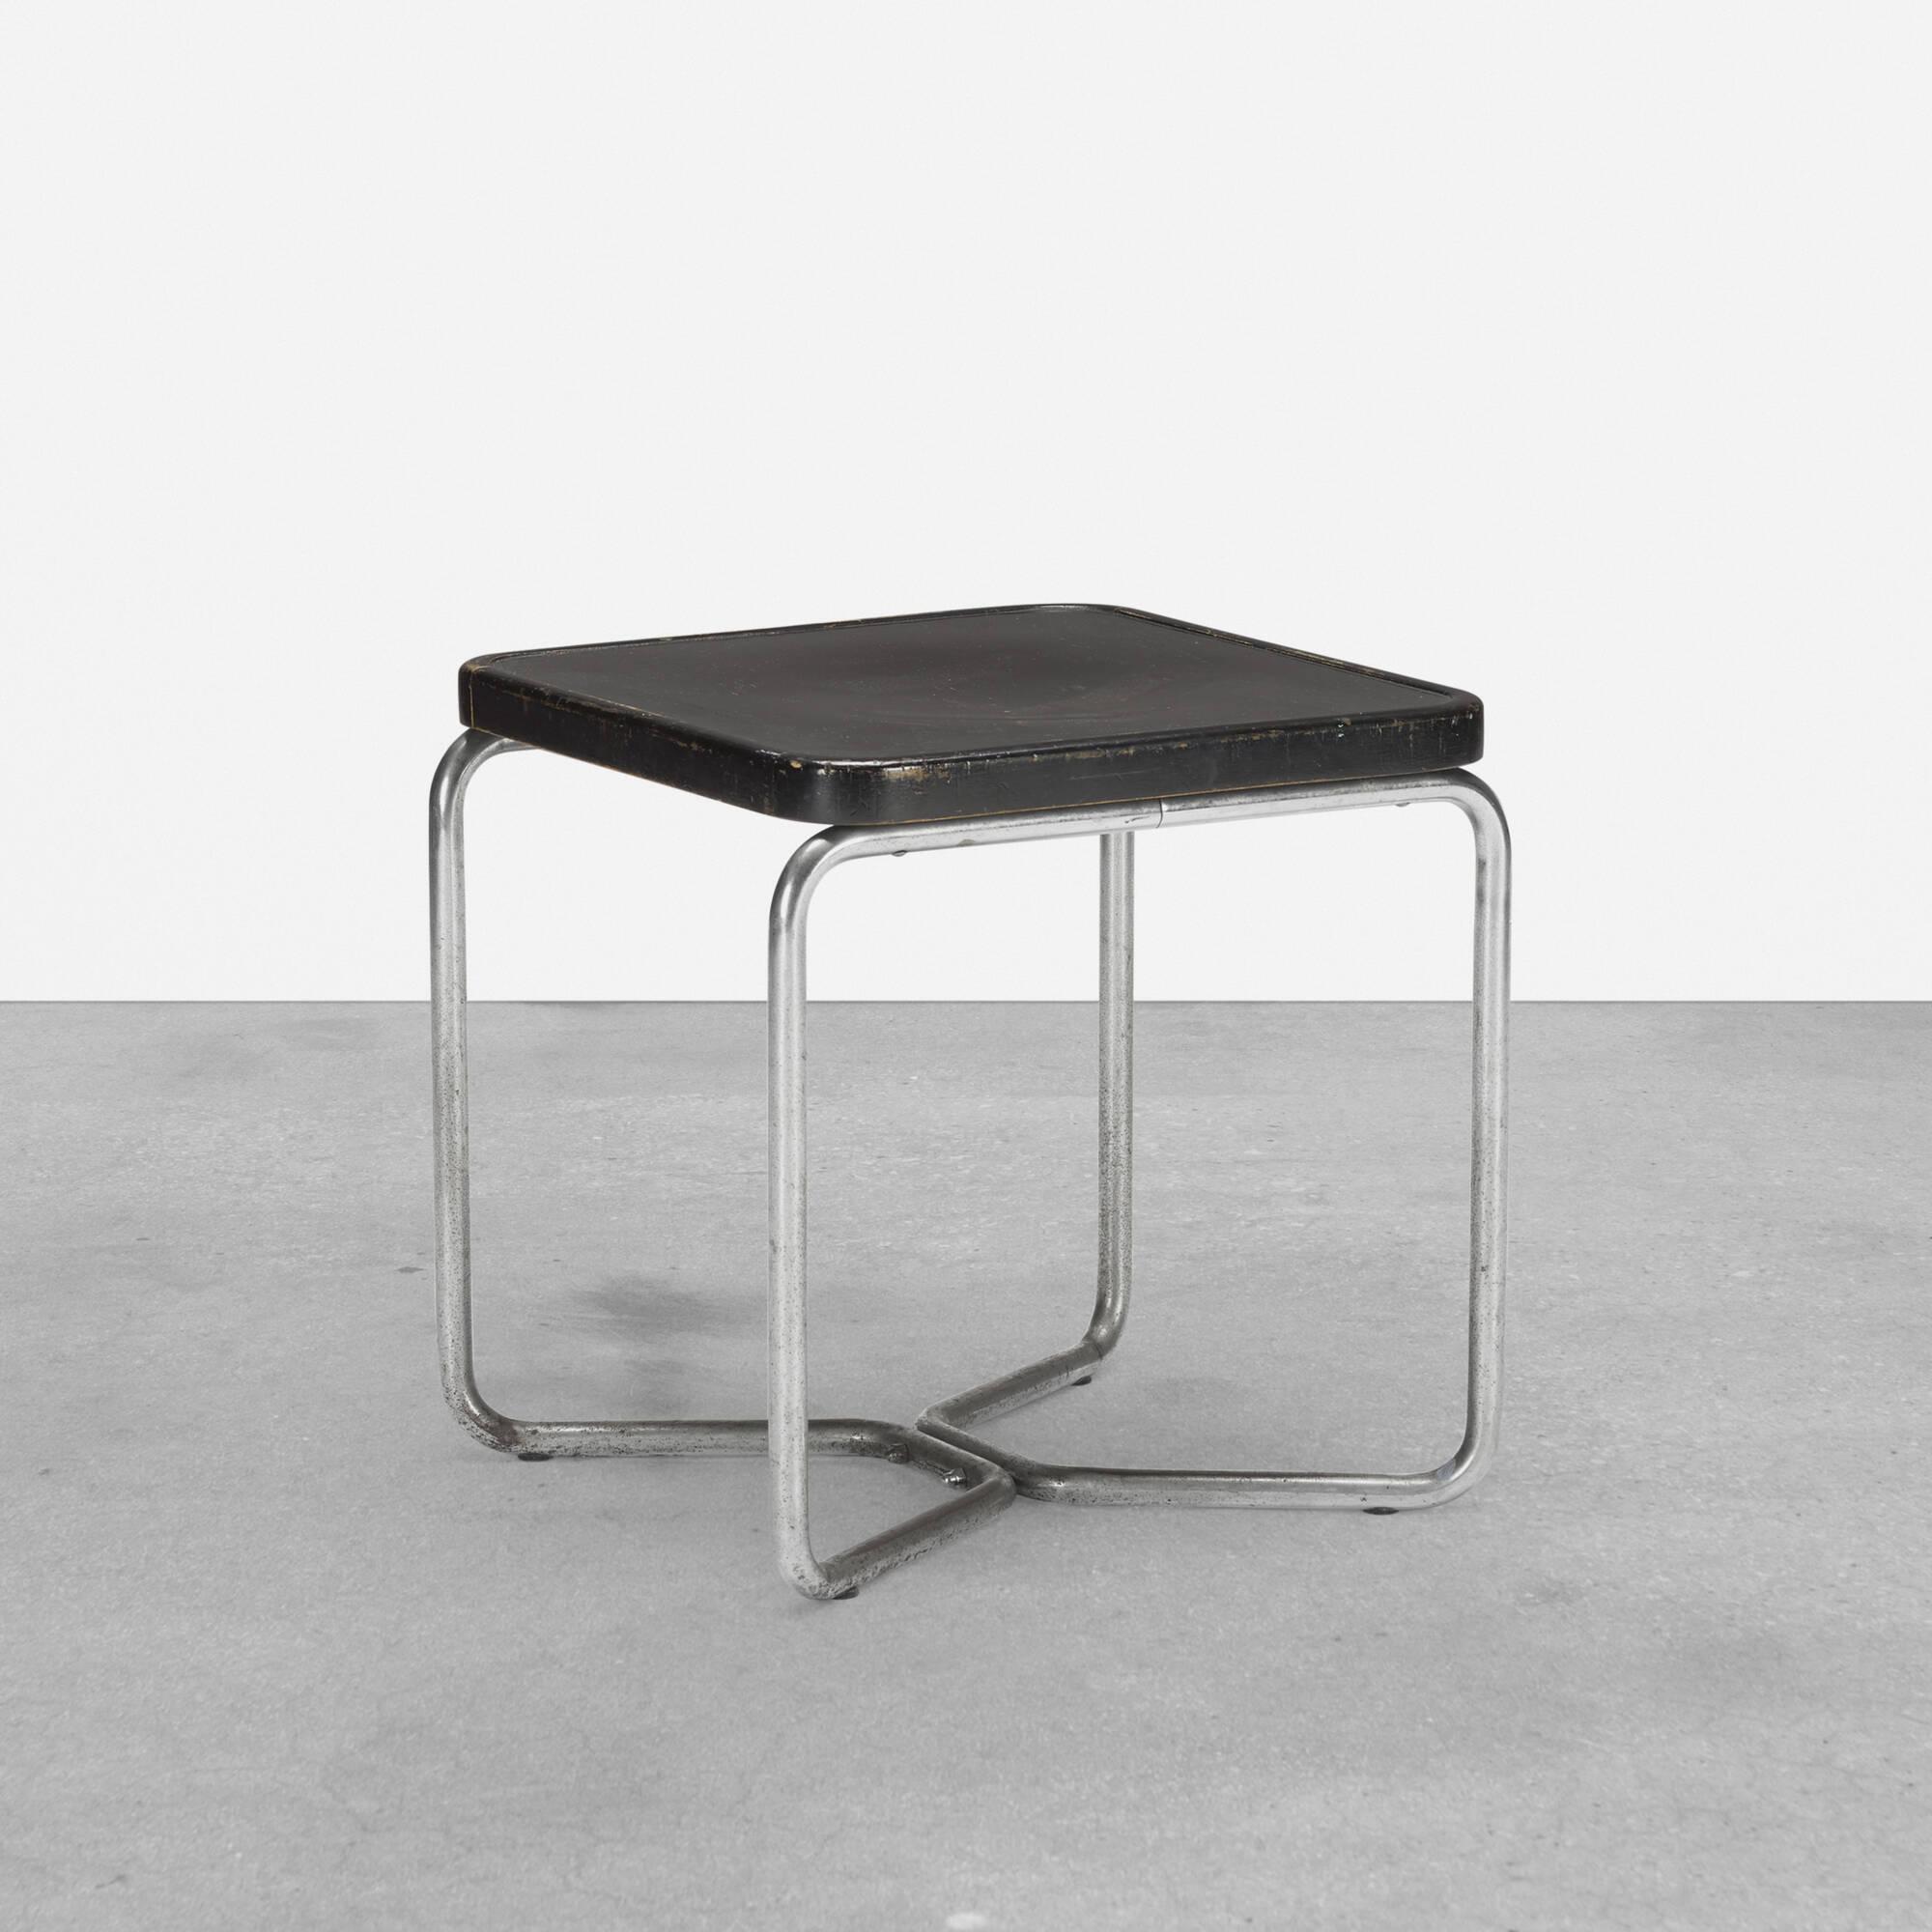 148: Marcel Breuer / stool, model B56 (1 of 2)